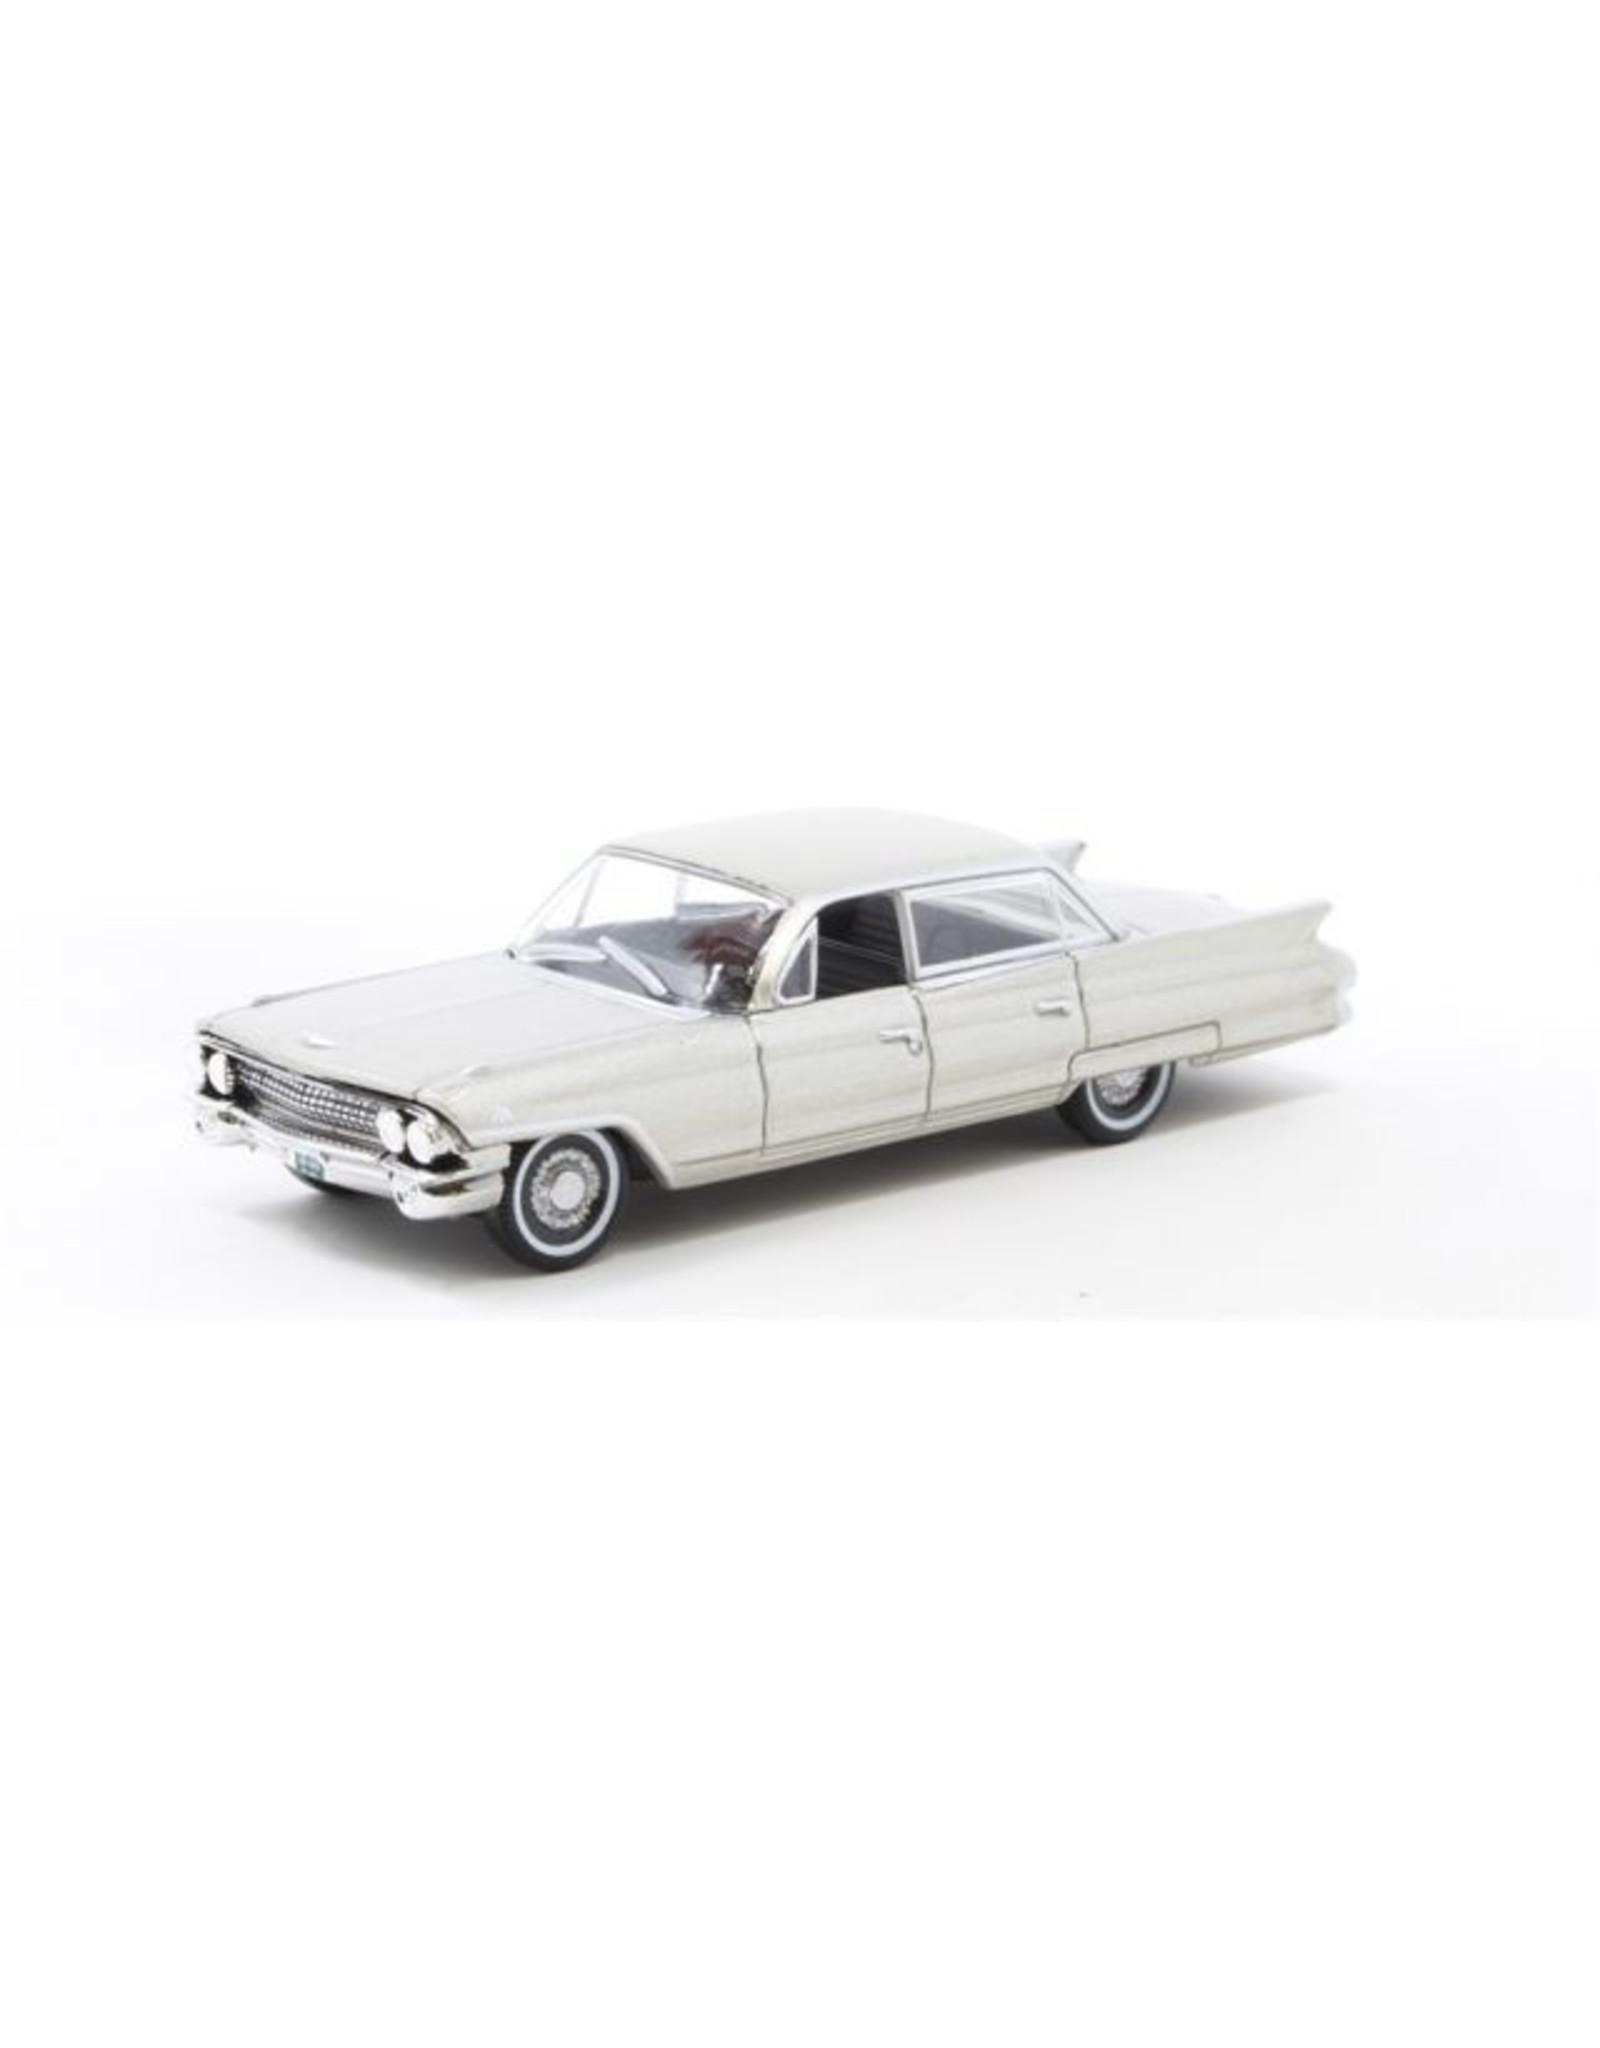 Cadillac(General Motors) CADILLAC SEDAN DEVILLE 1961(Aspen gold metallic)